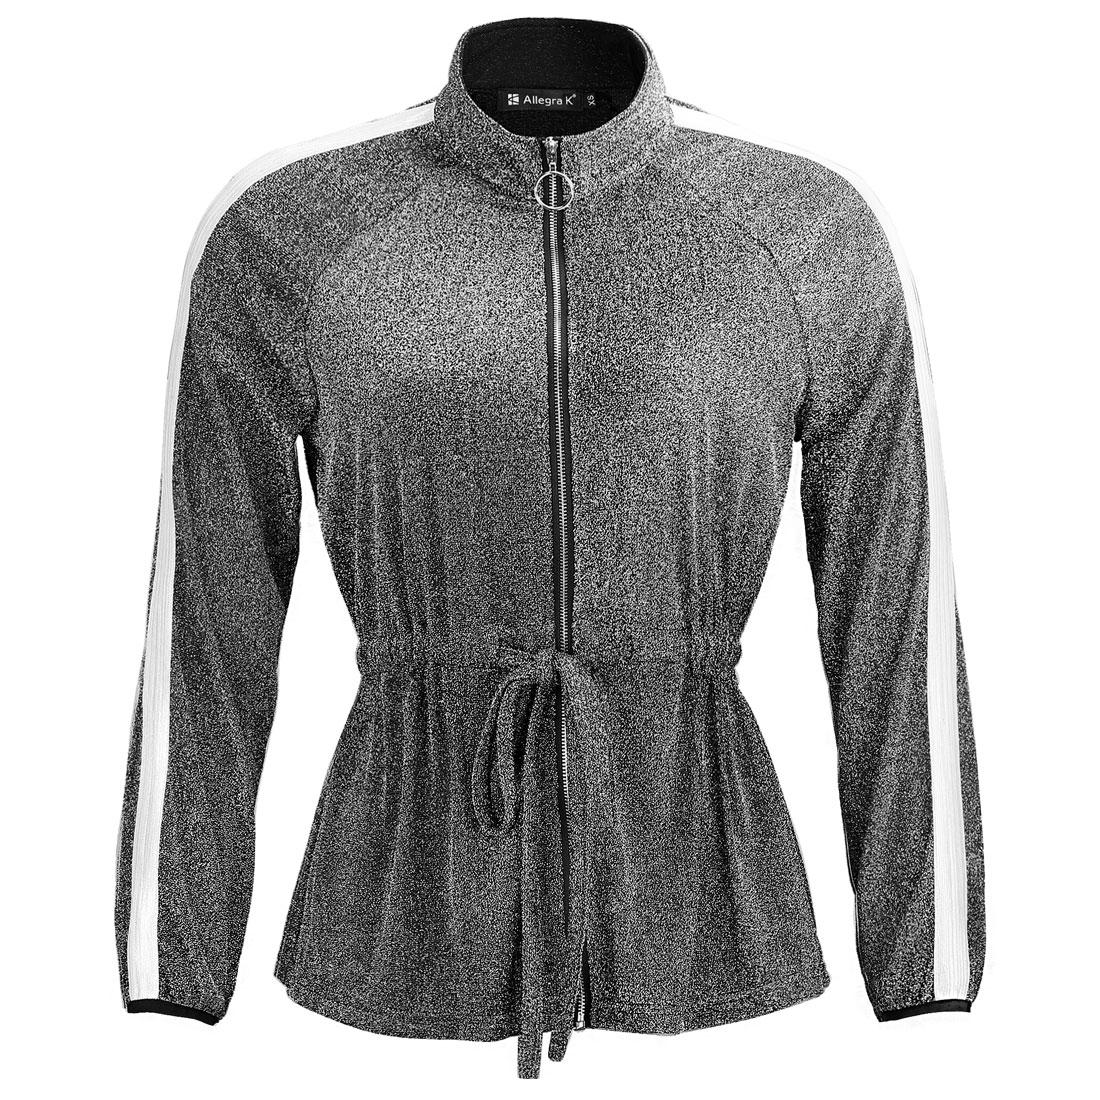 Women's Glitter Lightweight Zip Waist Drawstring Jacket Black L (US 14)